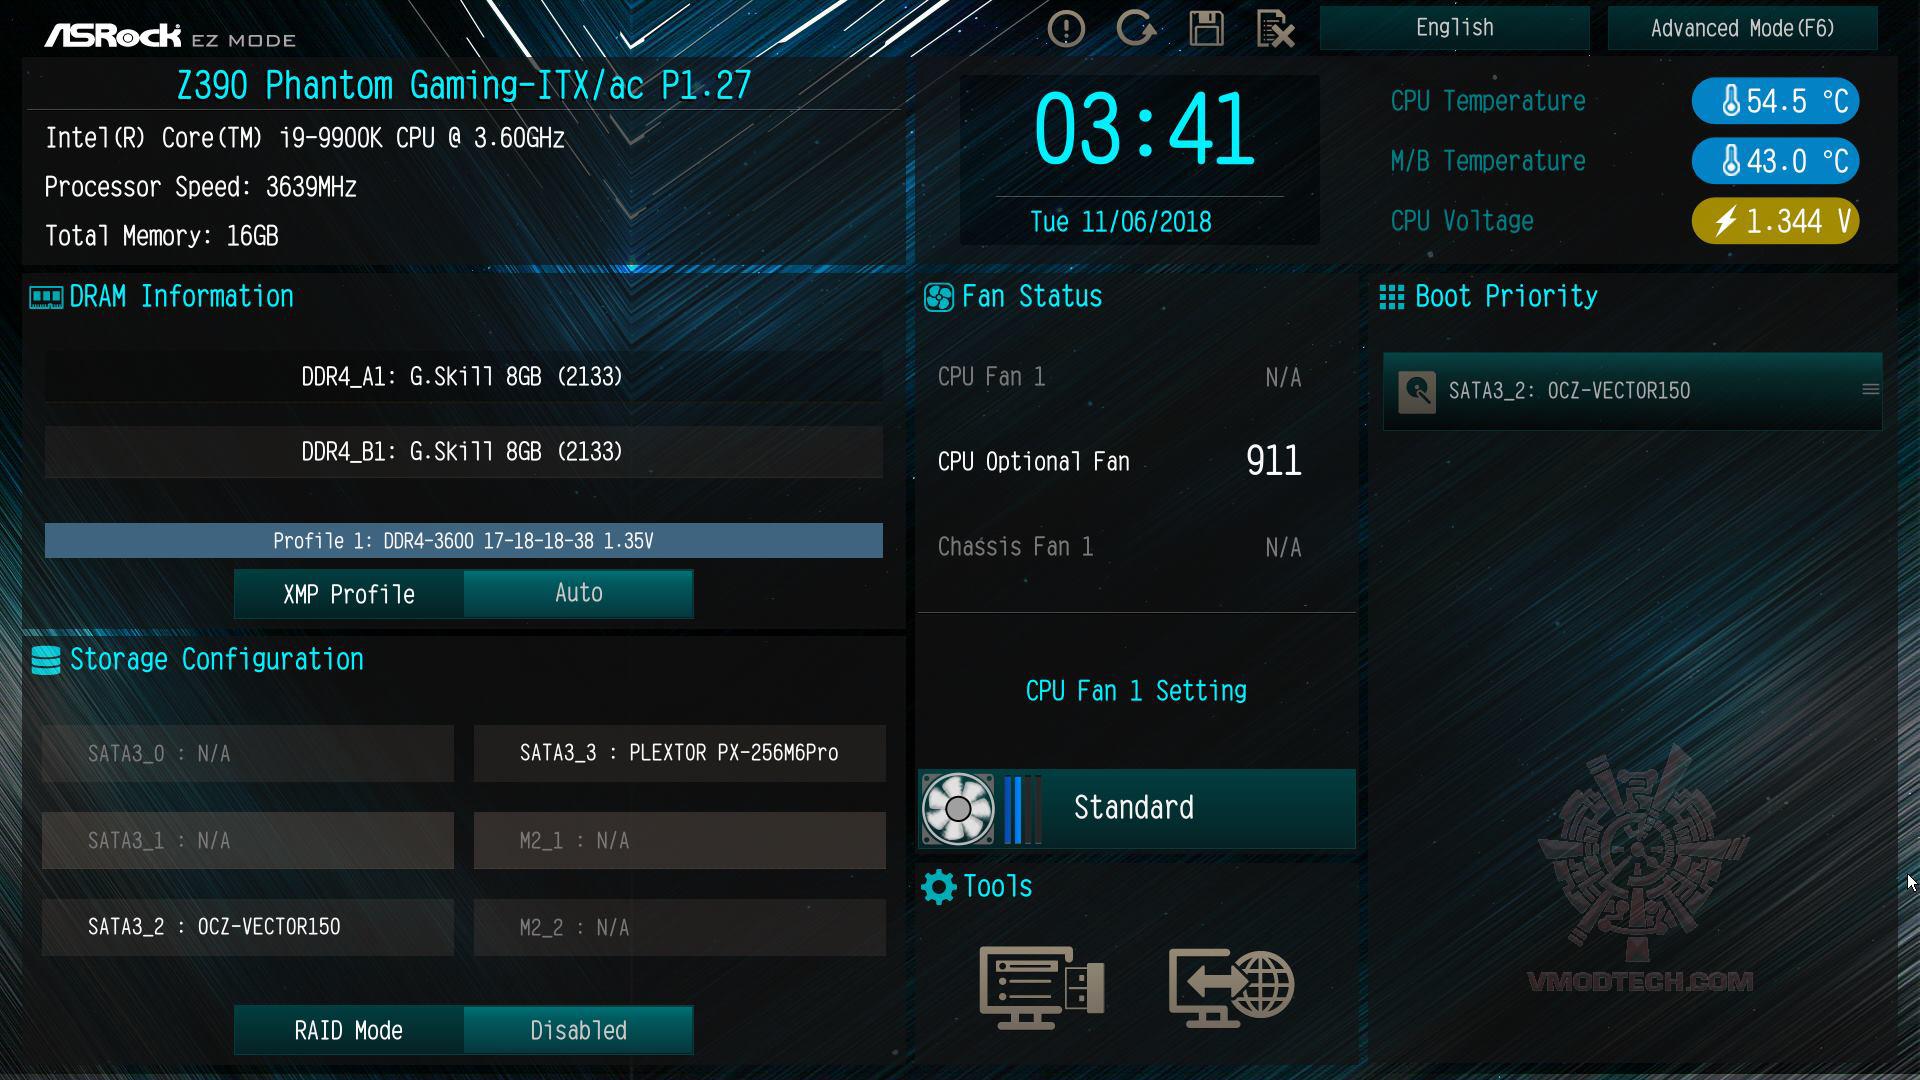 45657539 346501182772836 8153752689969201152 n ASRock Z390 Phantom Gaming ITX/ac Review